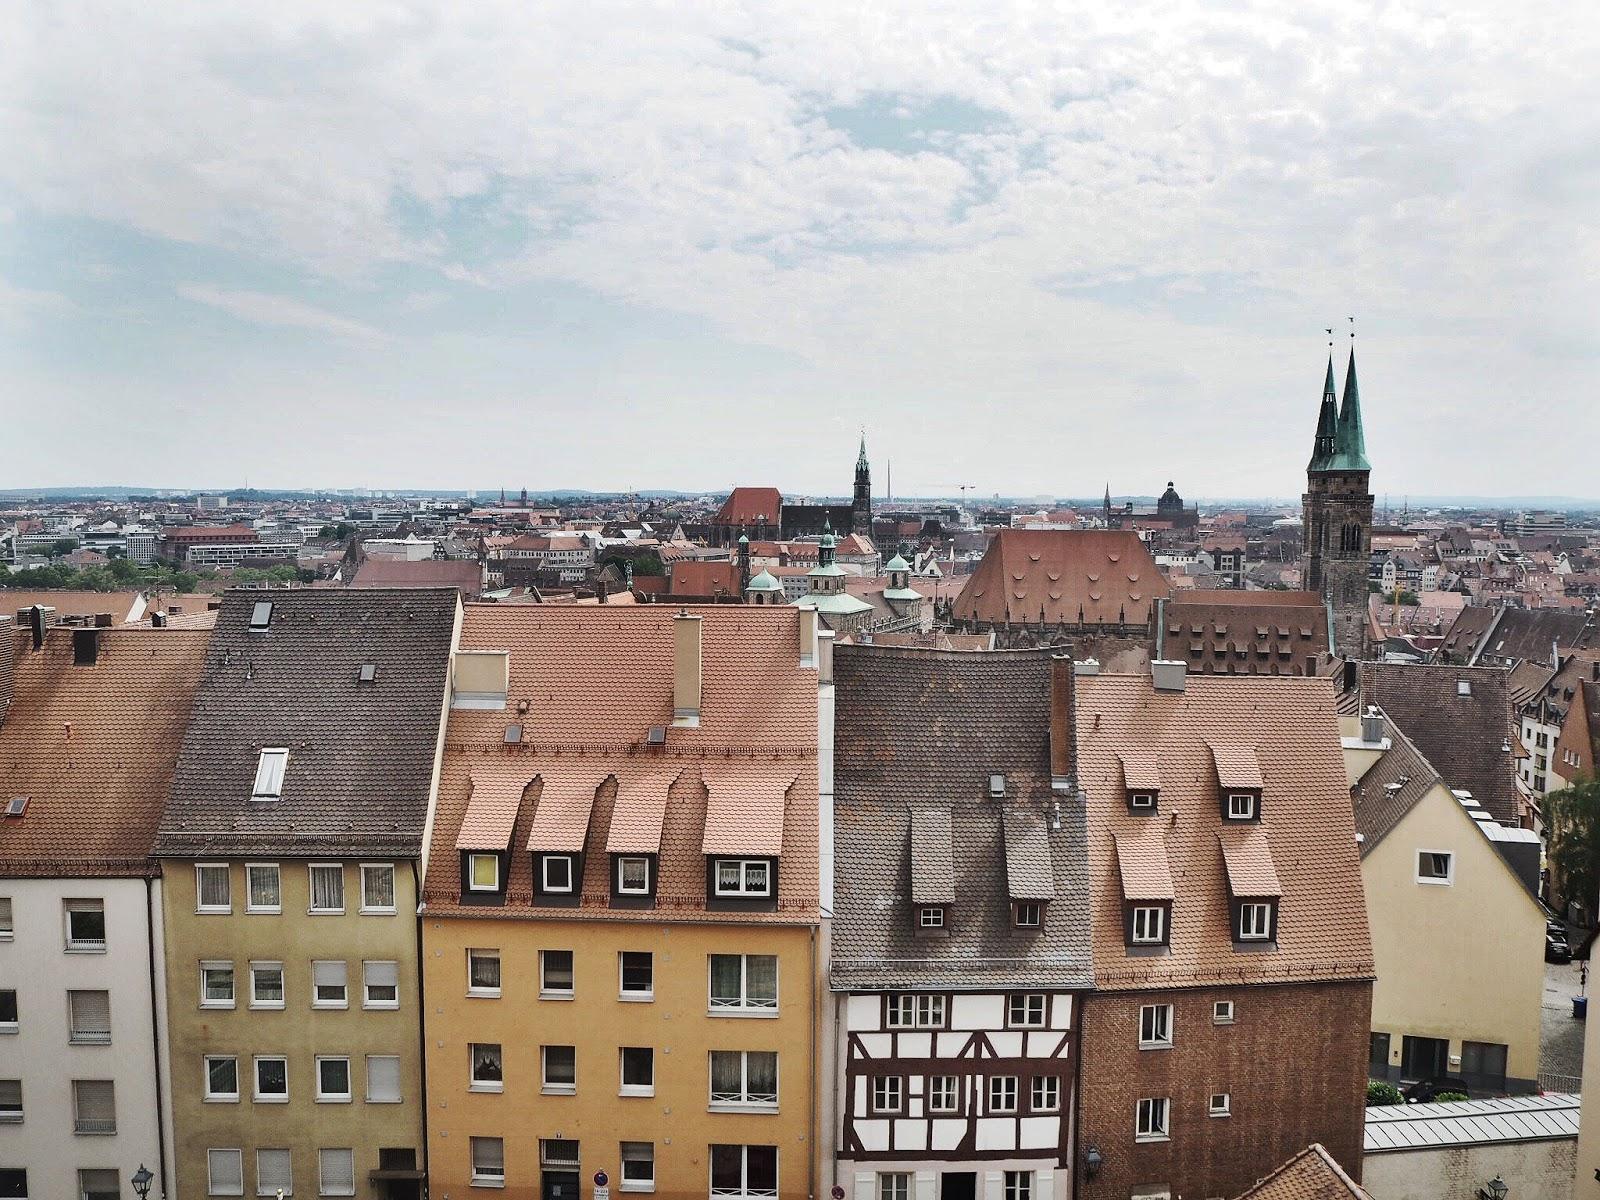 Travel: A Day in Nuremberg - The Travel Guide   Hollie in Wanderlust   Travel Blogger   City Guide   Nürnberg